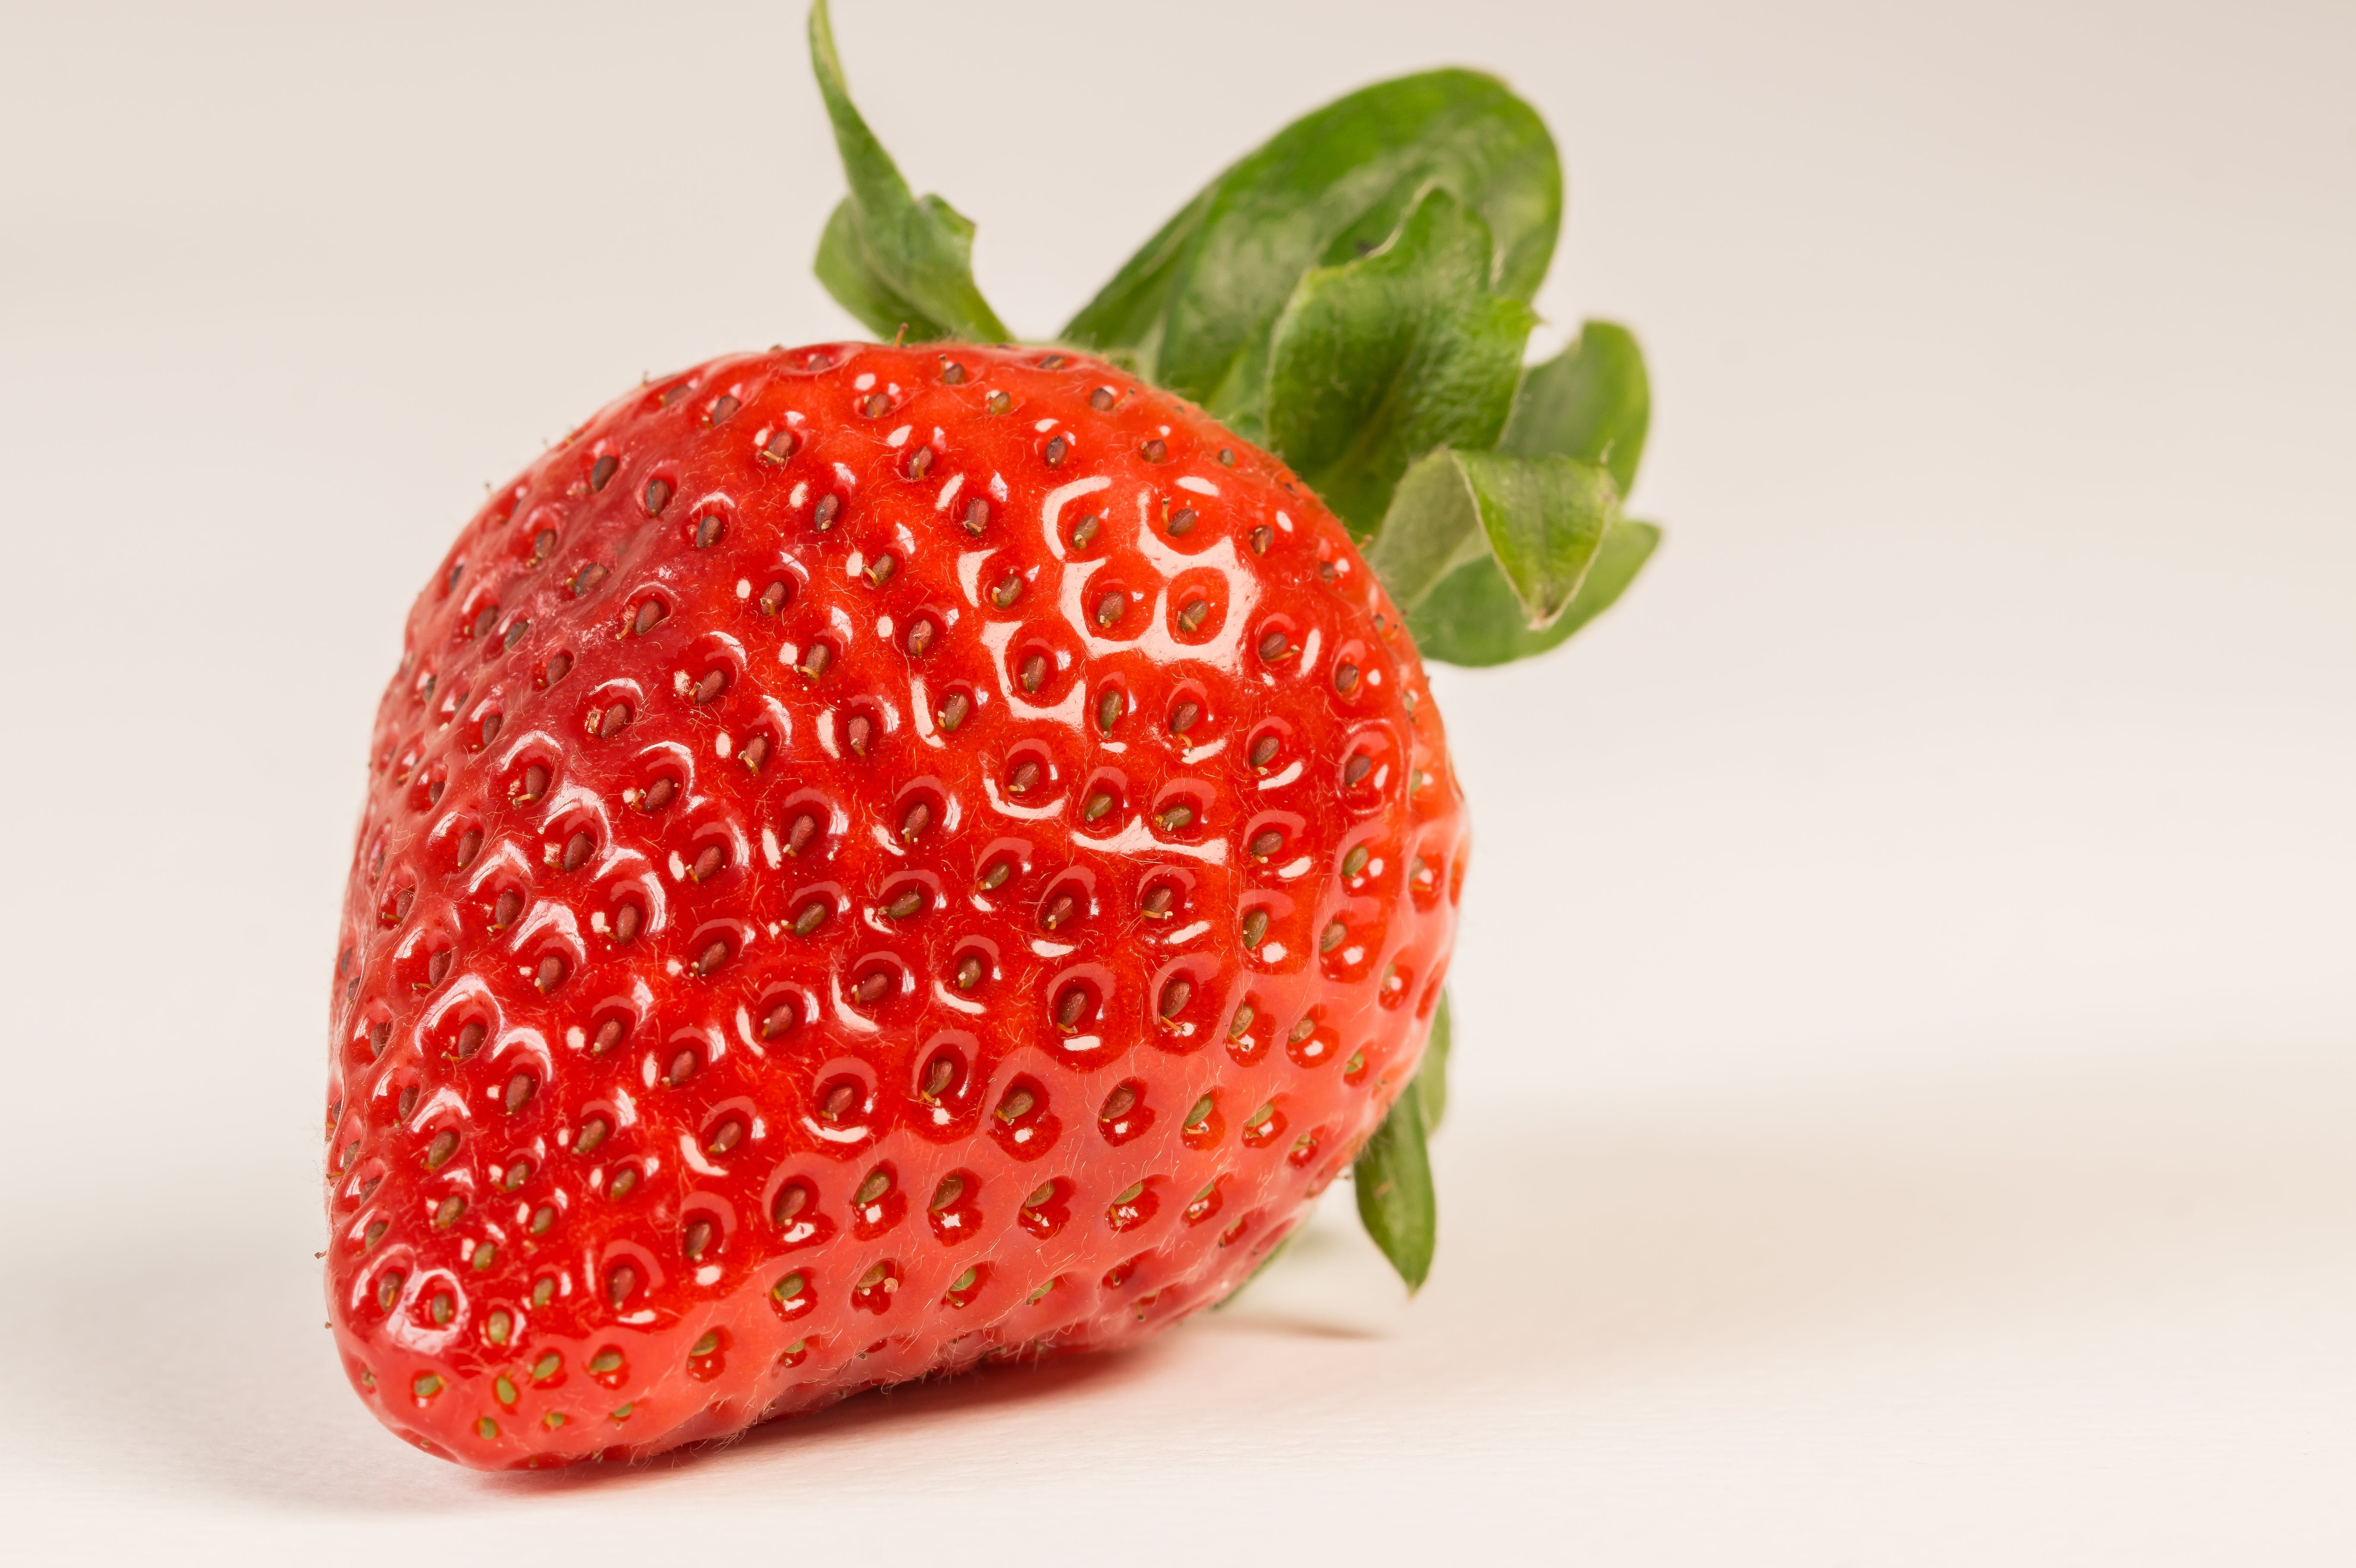 Macro Photography of Strawberry